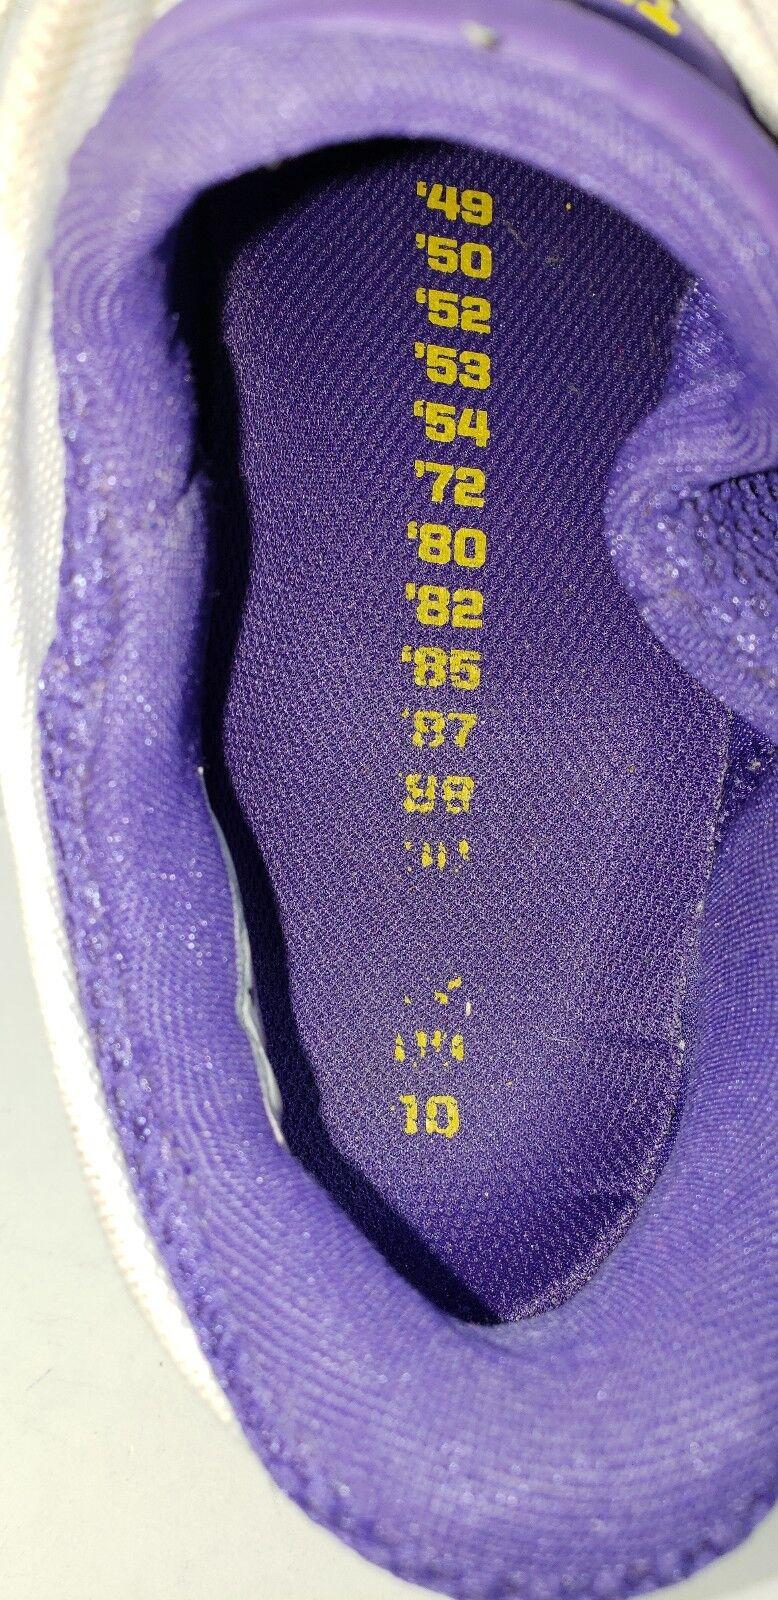 Nike Tri 360 360 360 Mens US 9 M Training Athletic Turnschuhe schuhe 454174-105 Weiß  O2 e0bd57